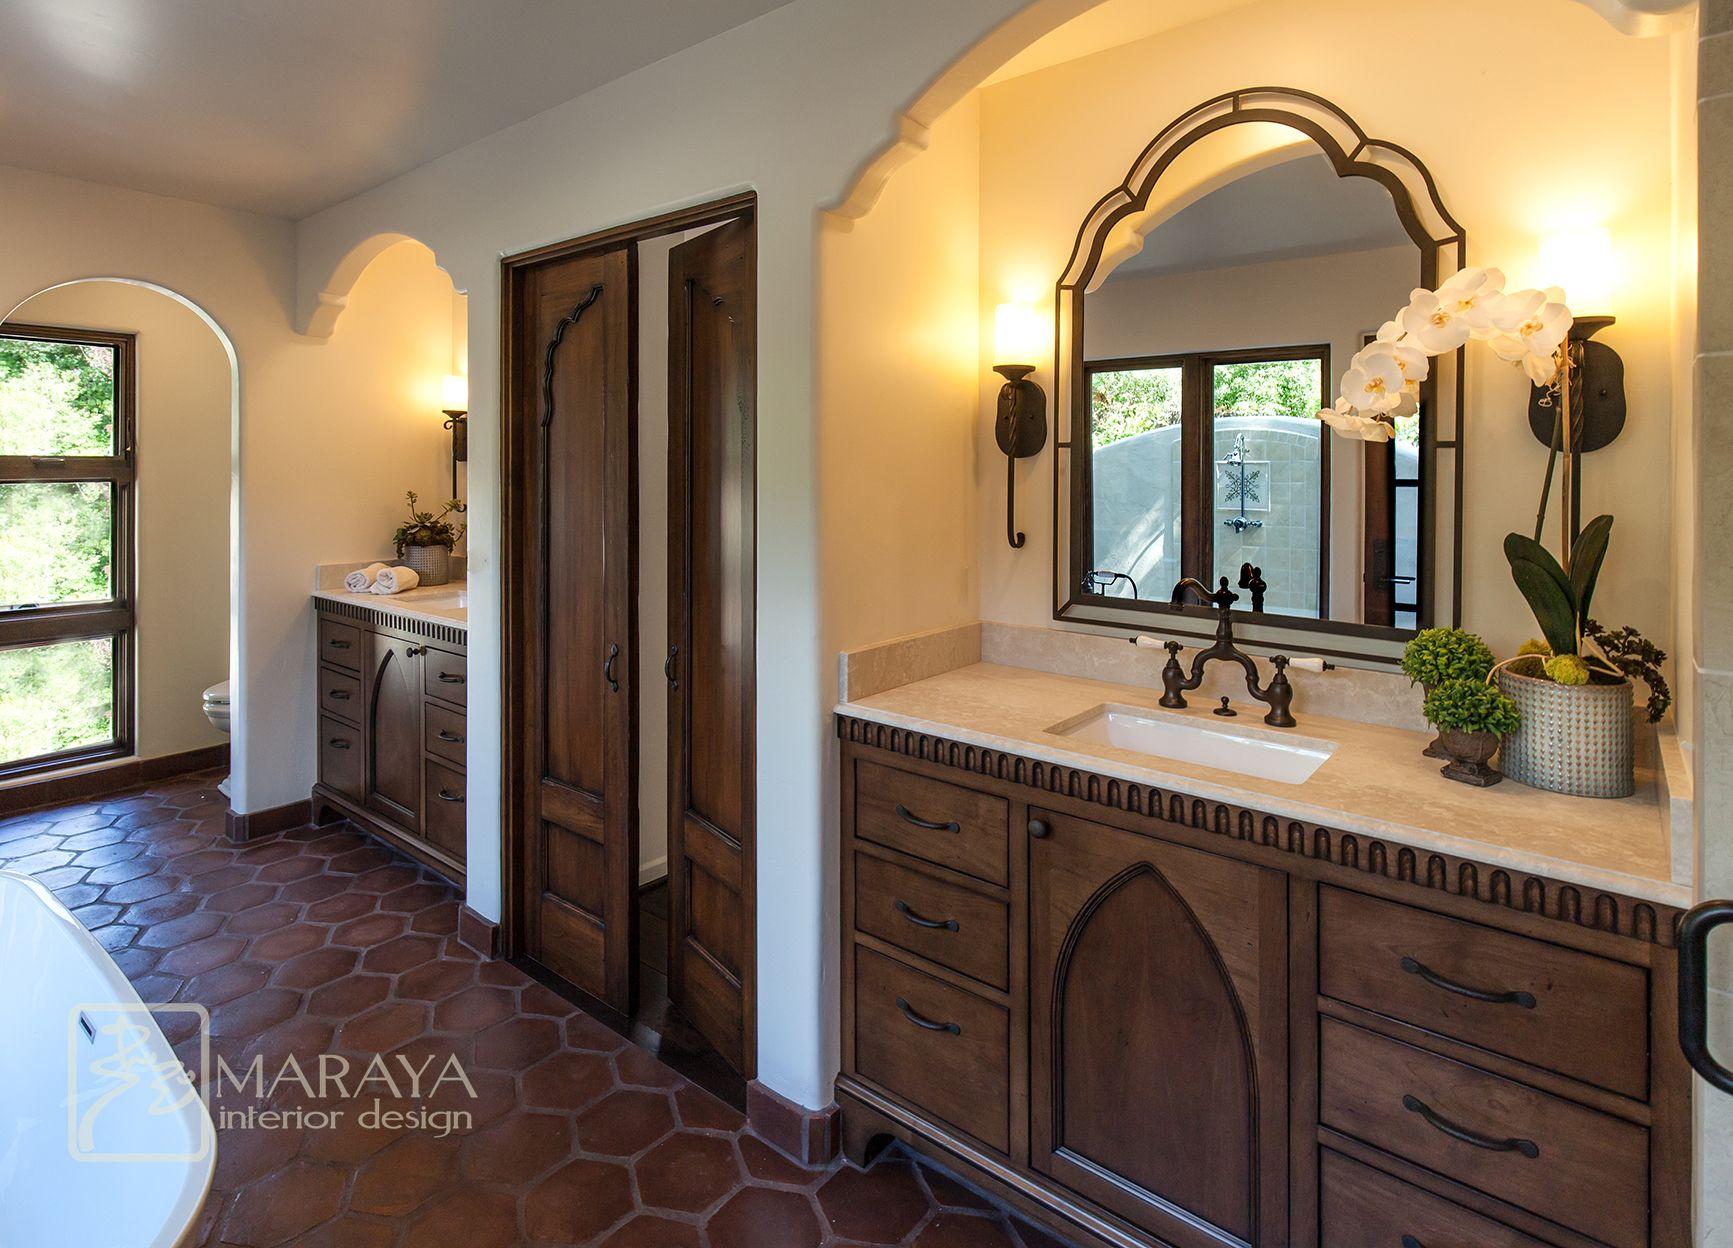 Maraya Interior Design Spanish and Indian Bath Amazing